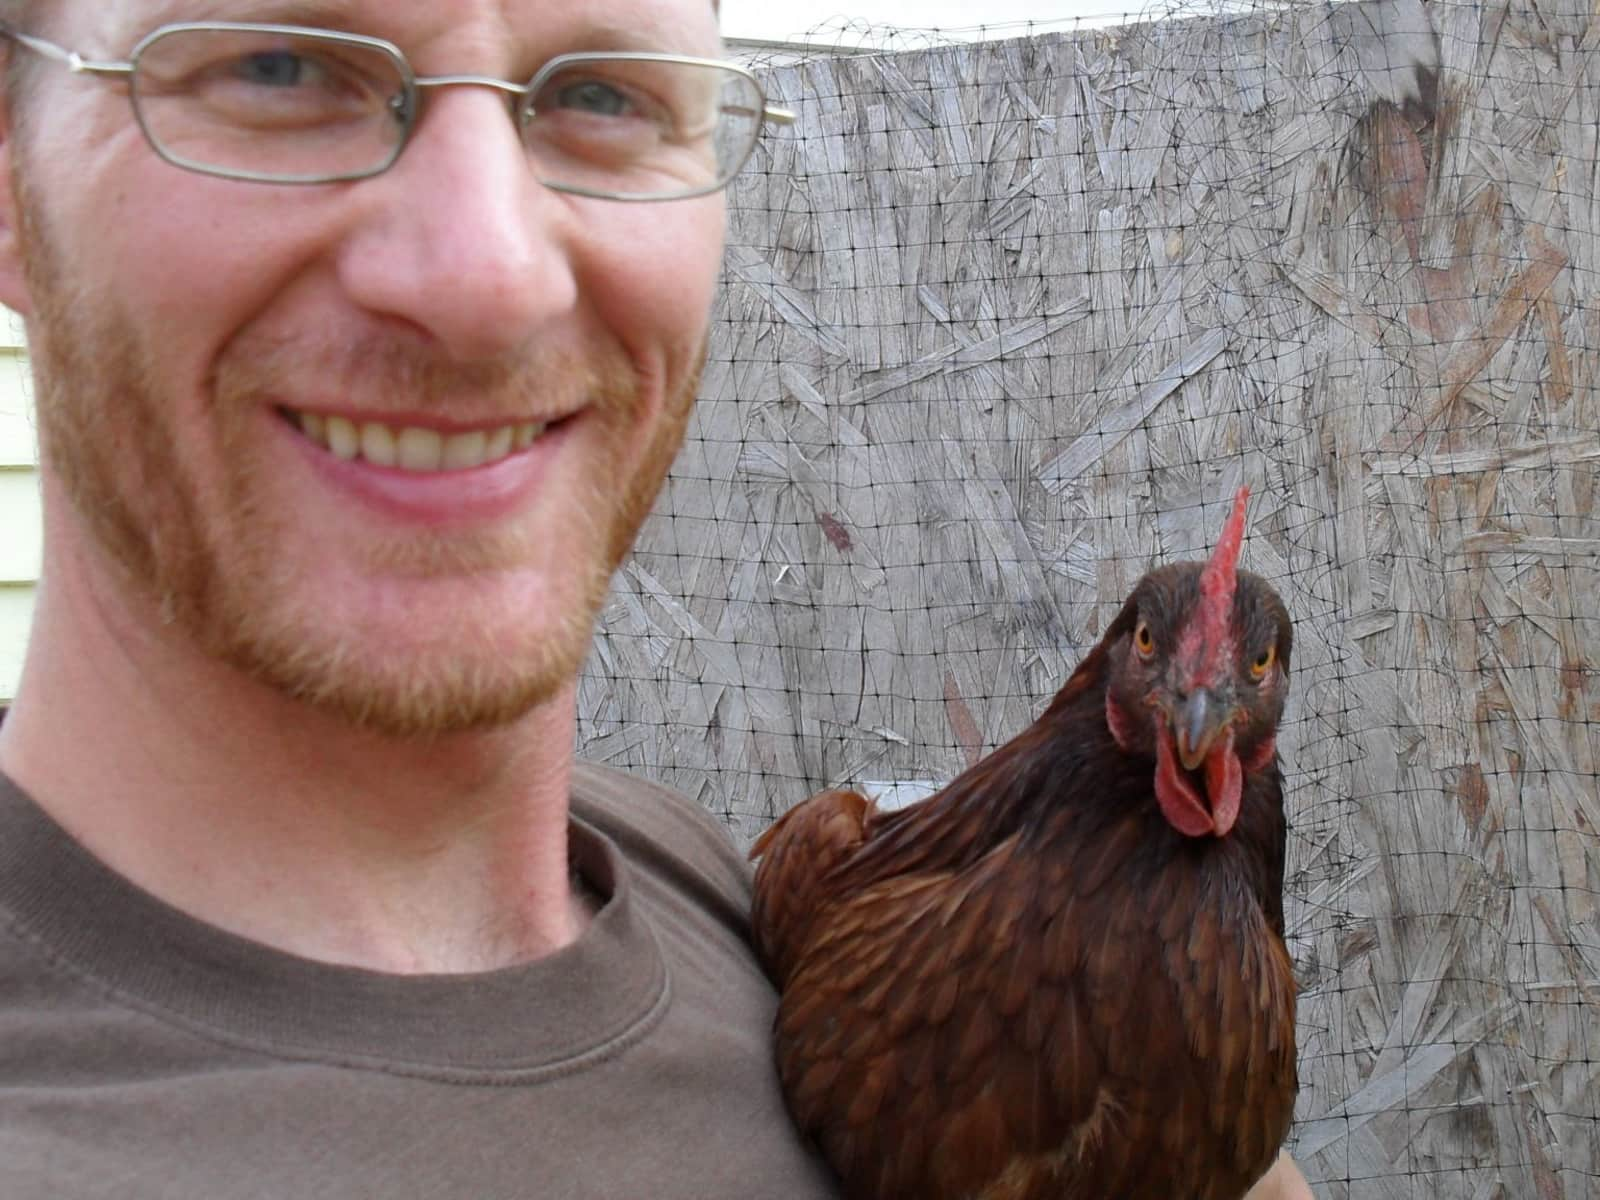 Daniel from Spokane, Washington, United States